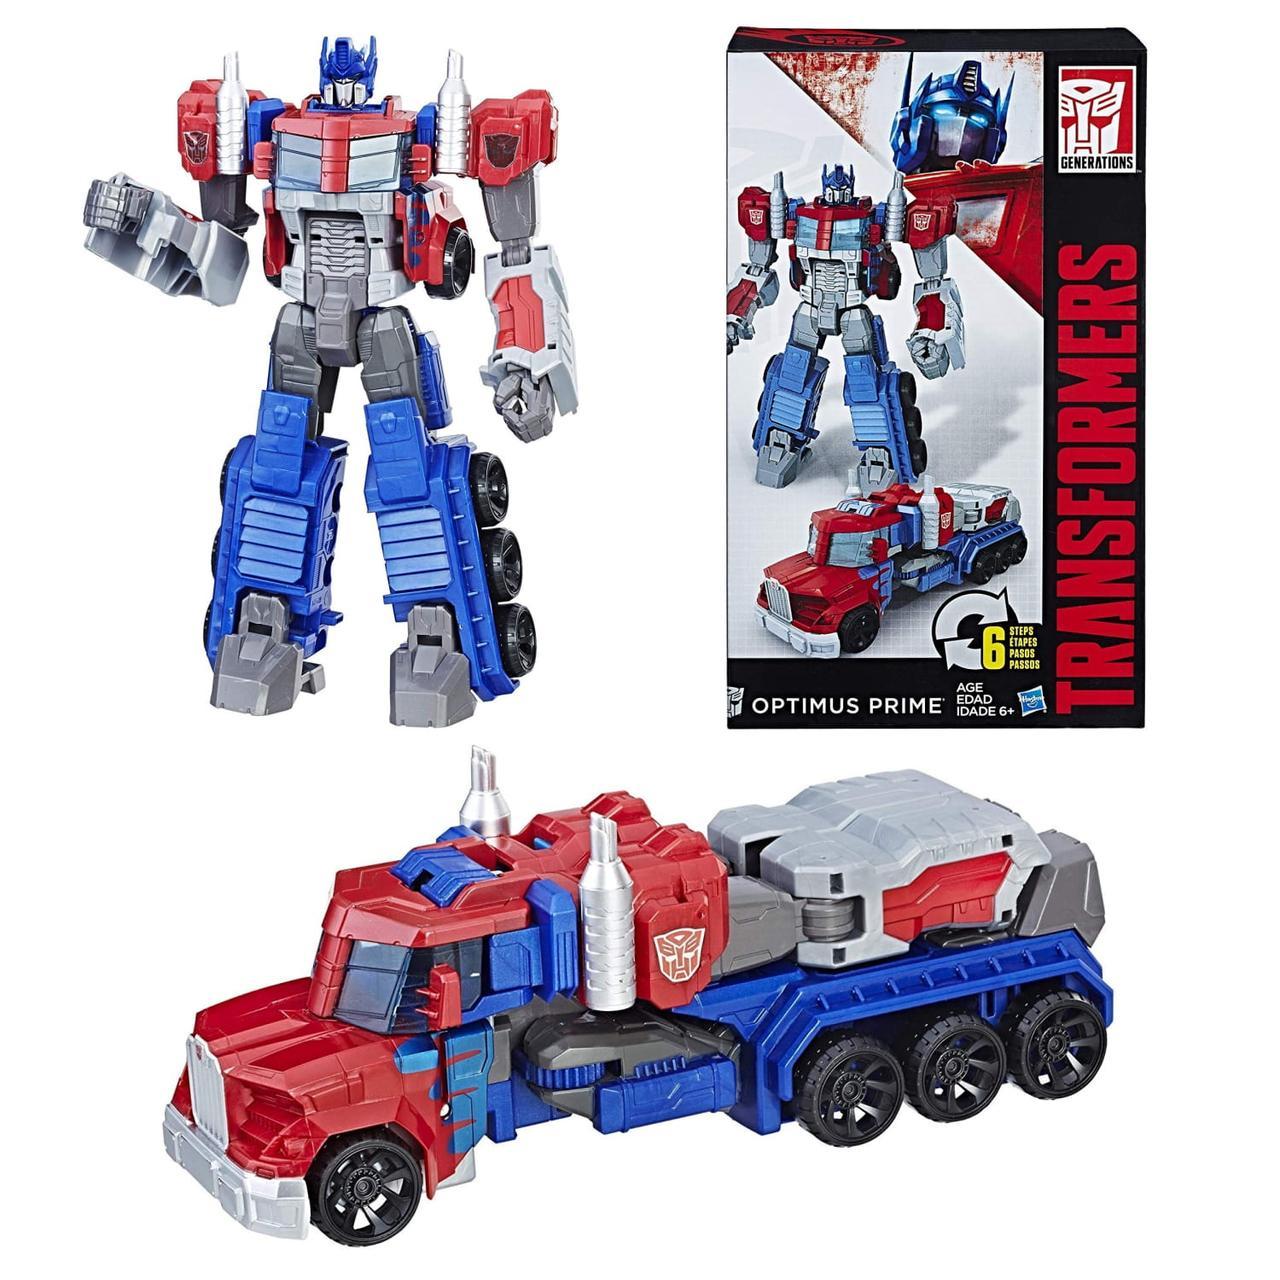 Робот-трансформер Оптимус Прайм Transformers Toys Heroic ...